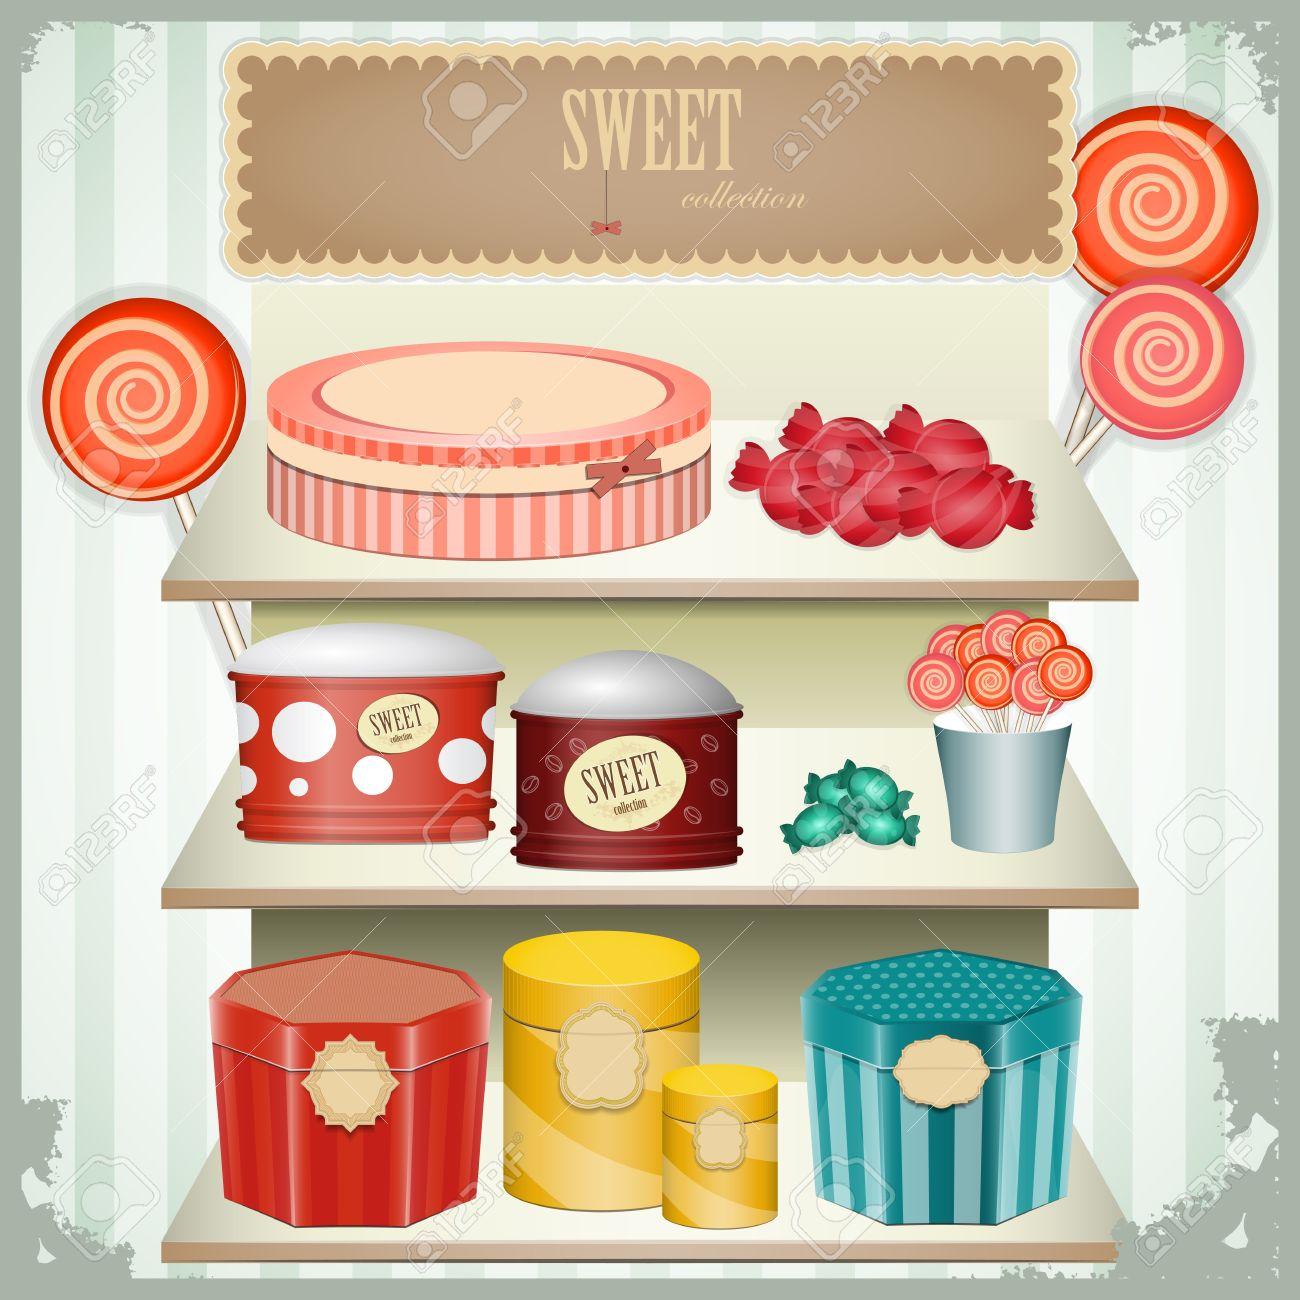 vintage postcard - shop sweets, confectionery - vector illustration Stock Vector - 12324706